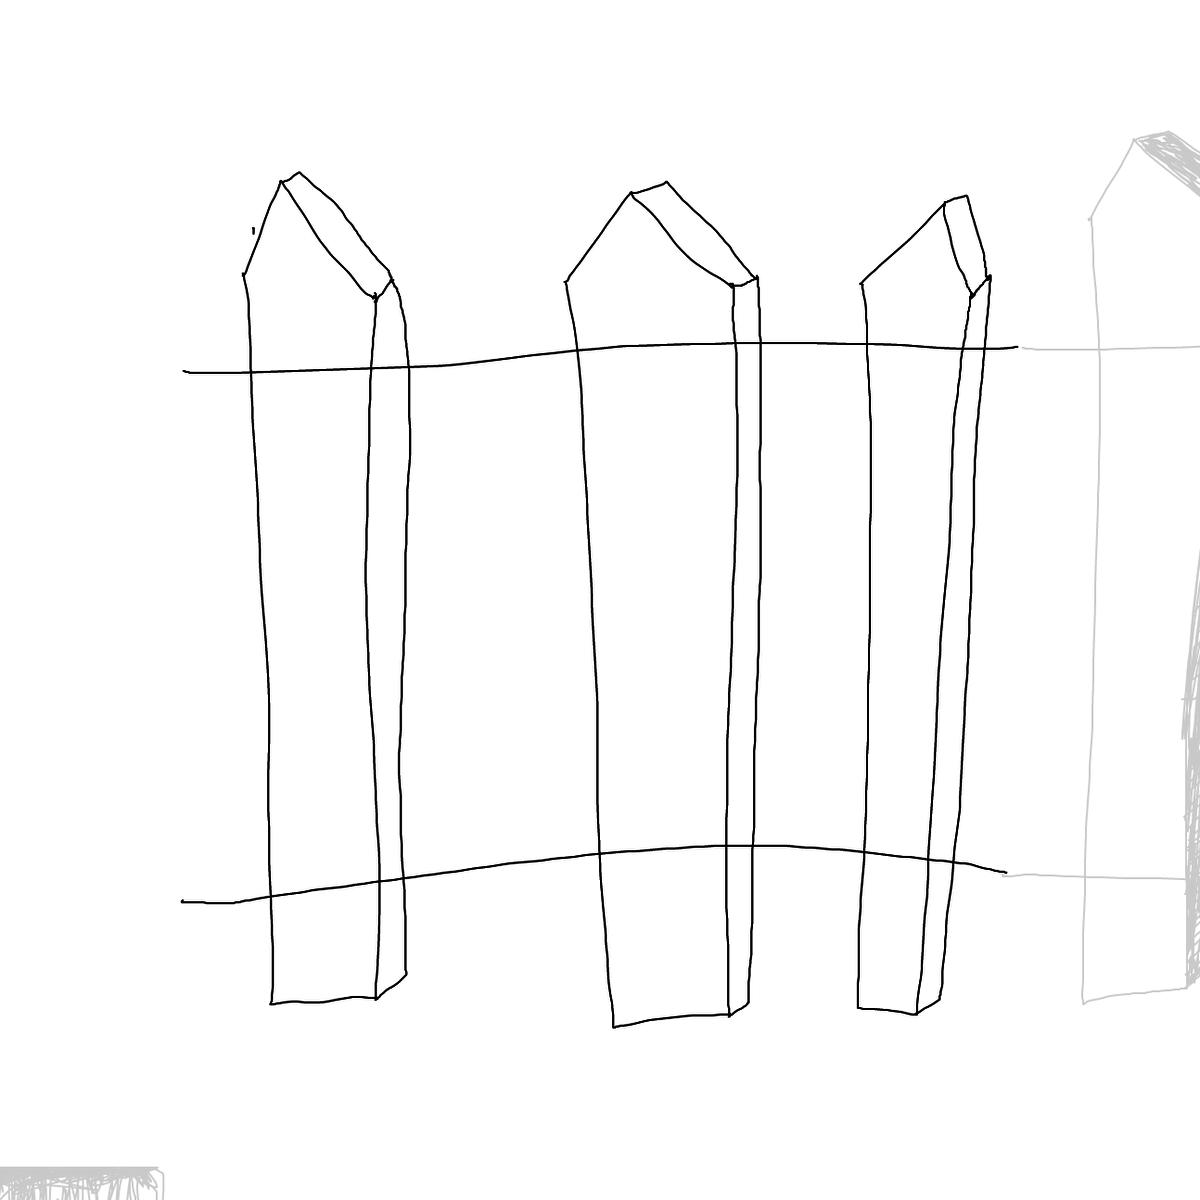 BAAAM drawing#16131 lat:52.4752502441406250lng: 13.4058856964111330